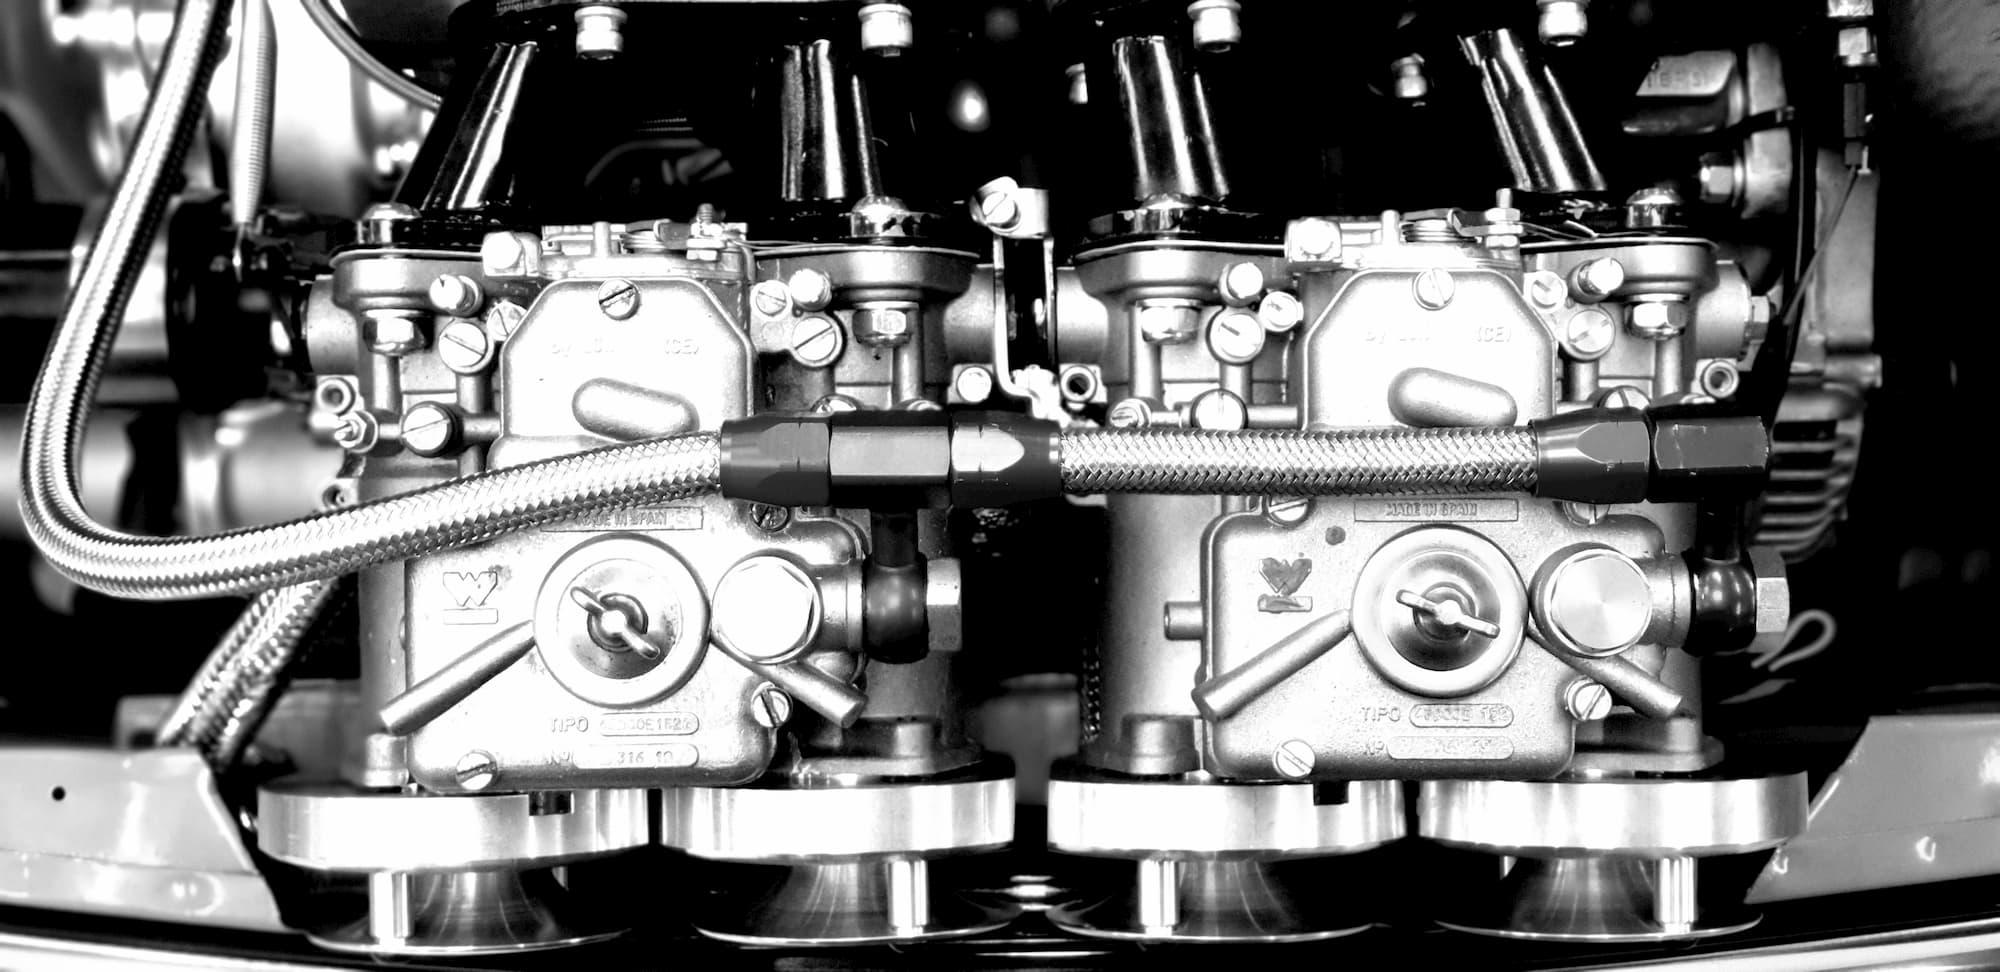 British racing car Mini Austin MK2 - Racing engineering